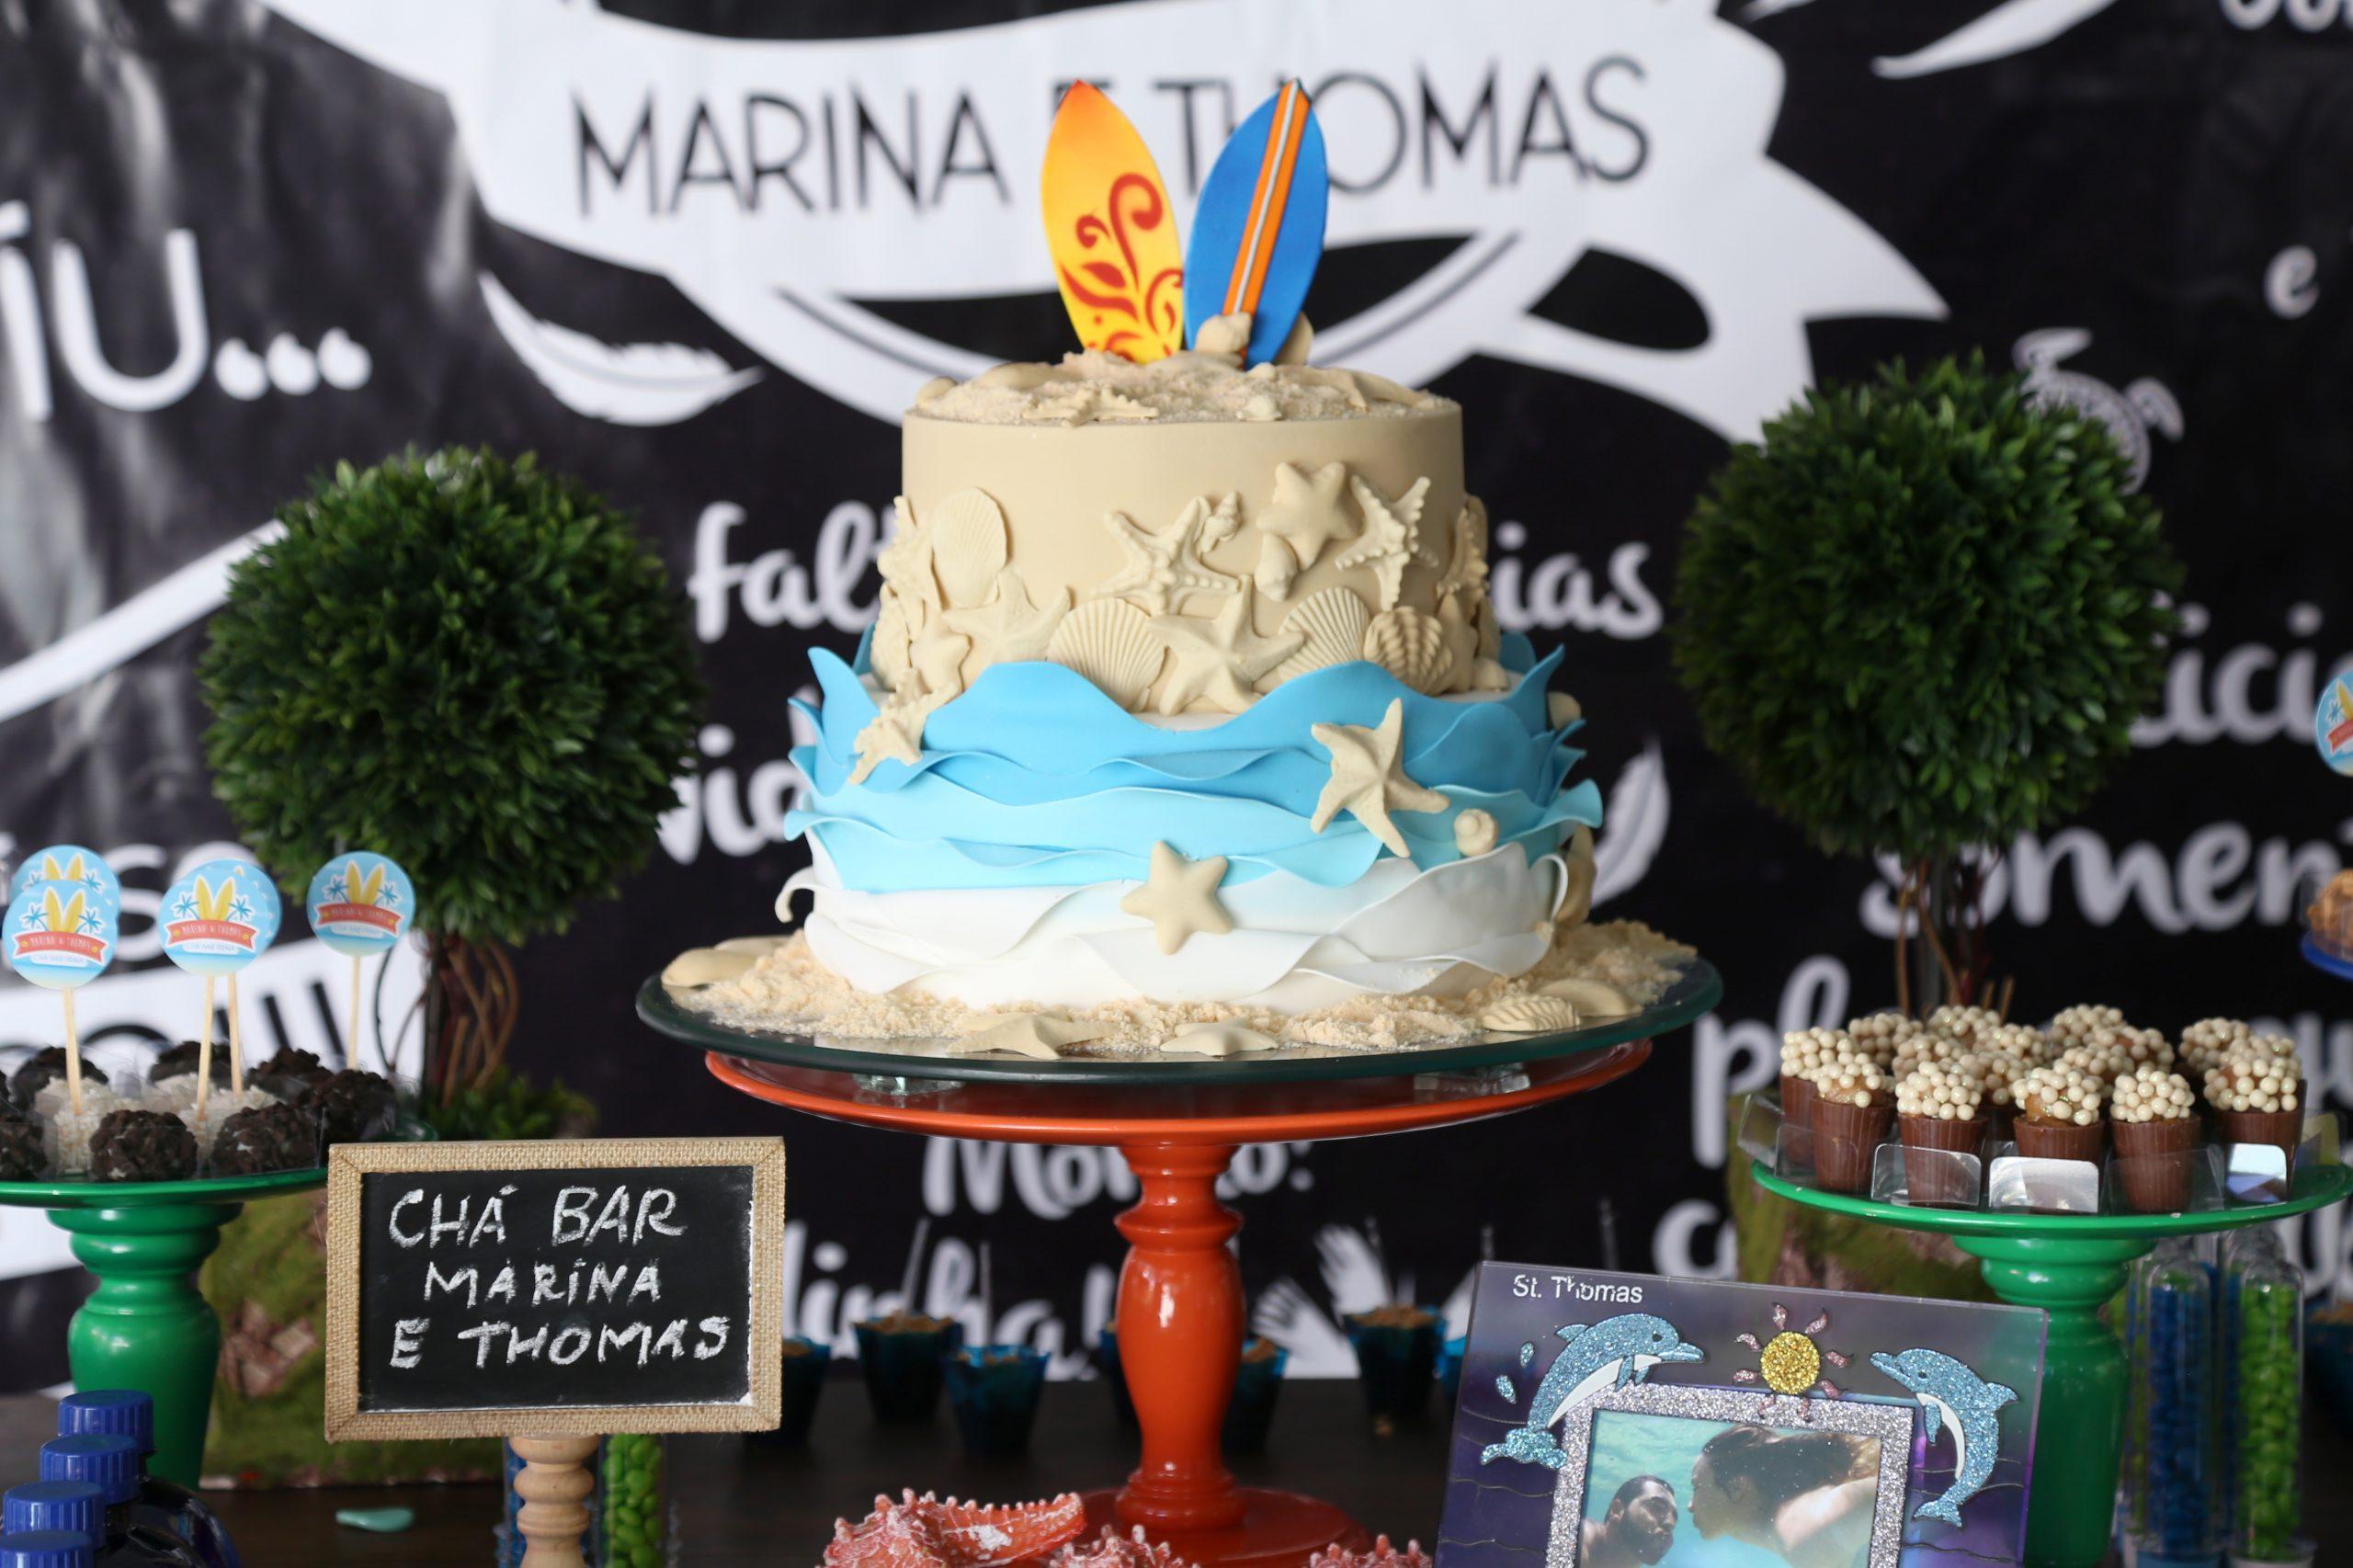 Chá Bar Marina e Thomas -